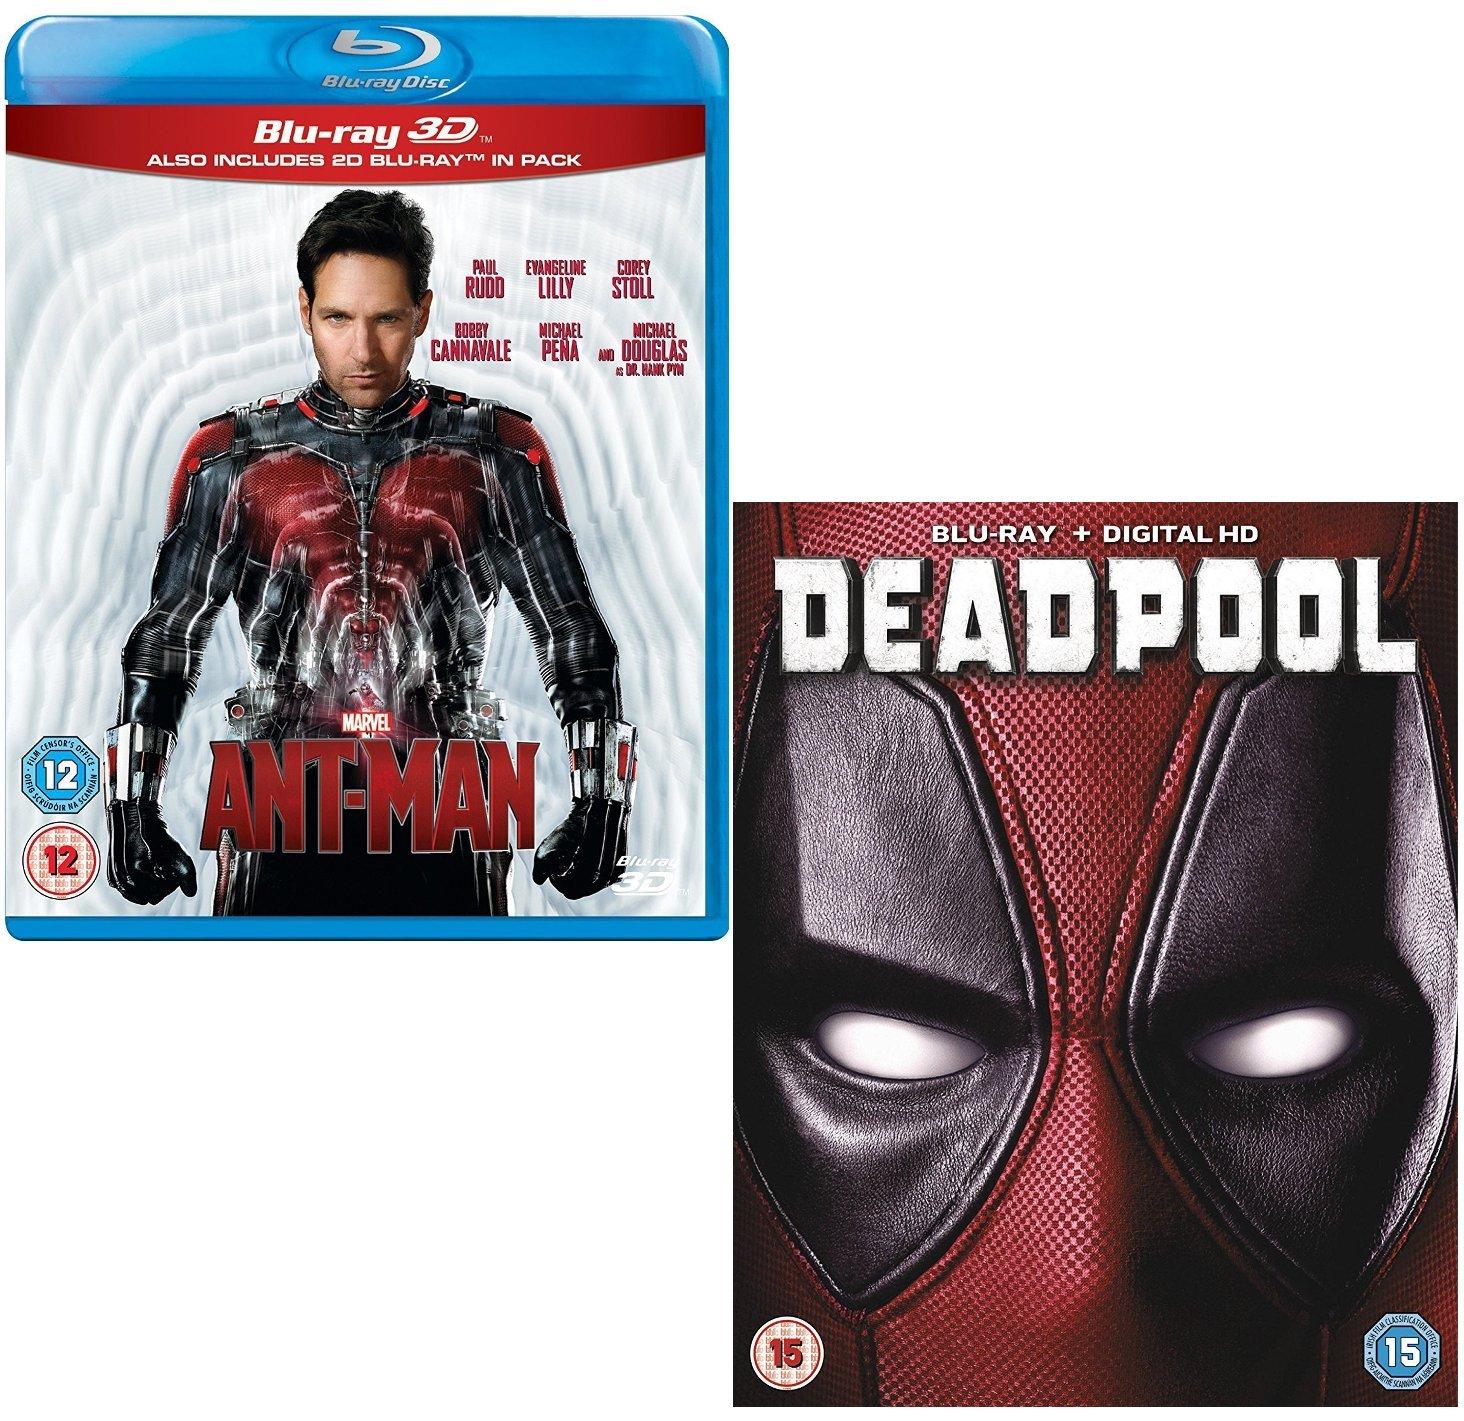 Amazon Com Ant Man 3d 2d Deadpool 2 Movie Bundling Blu Ray Movies Tv